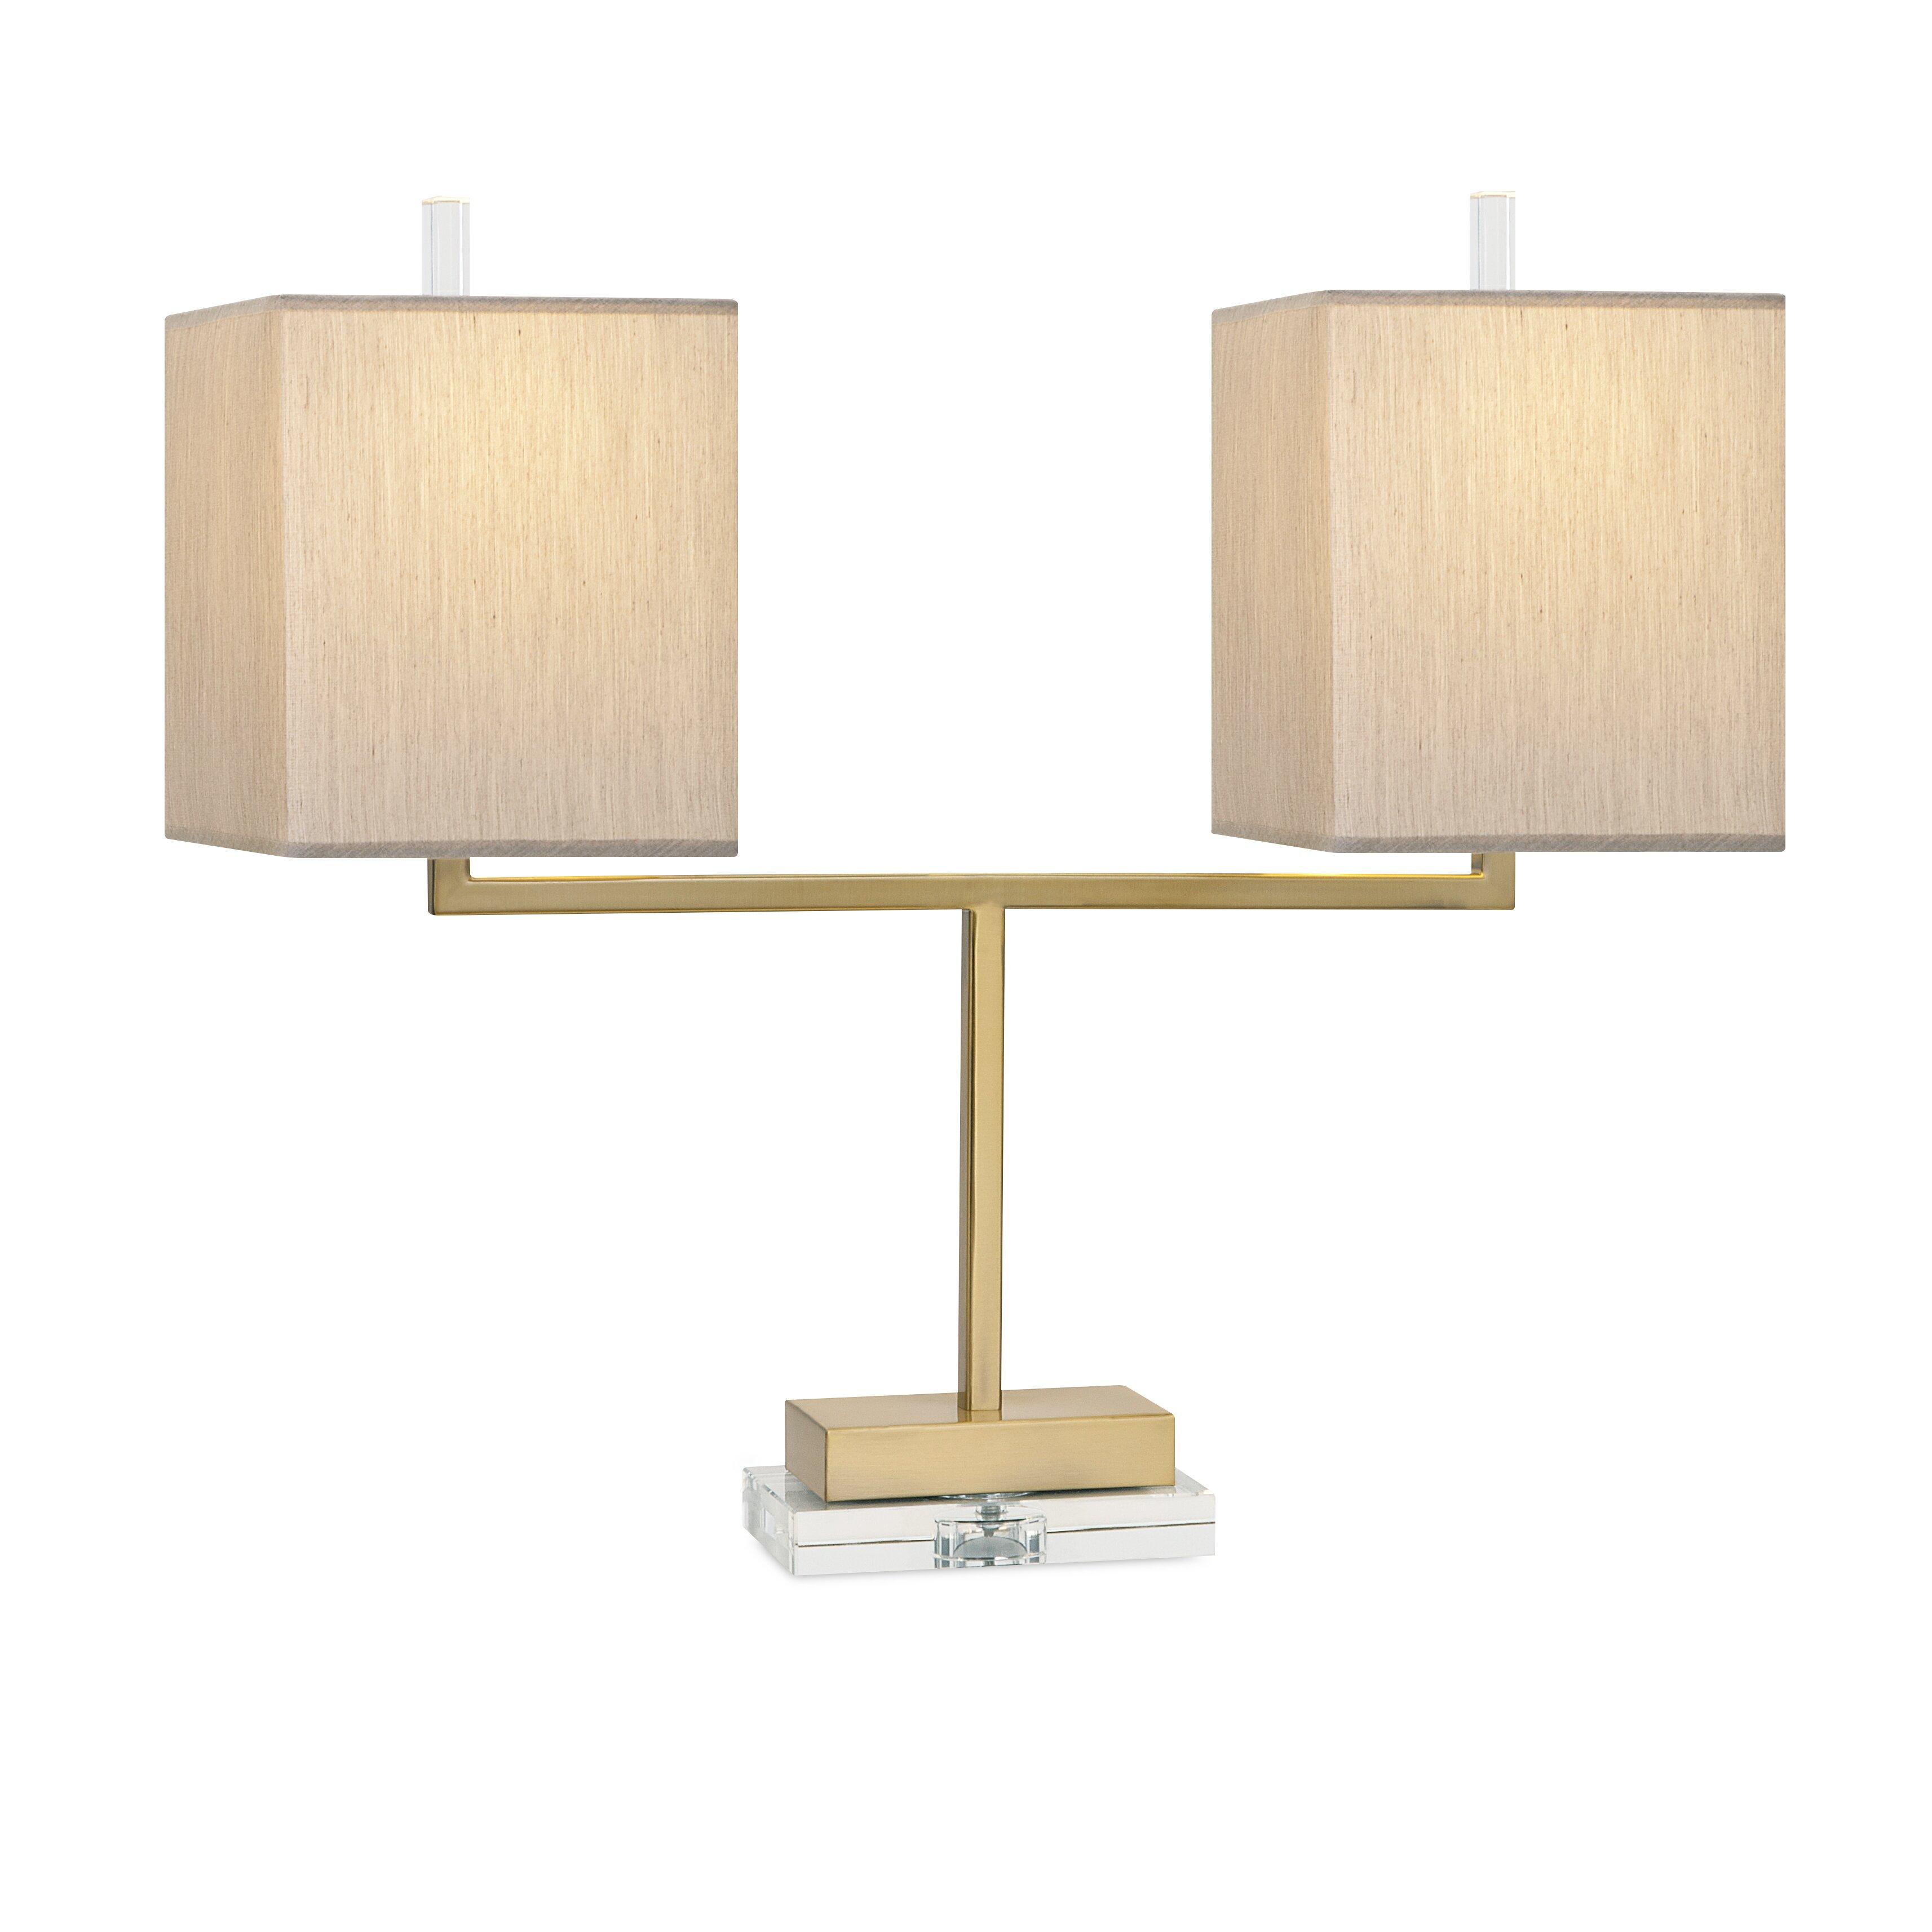 IMAX Beth Kushnick 27quot Table Lamp amp Reviews Wayfairca : IMAX Beth Kushnick 27 Table Lamp from www.wayfair.ca size 3427 x 3427 jpeg 443kB